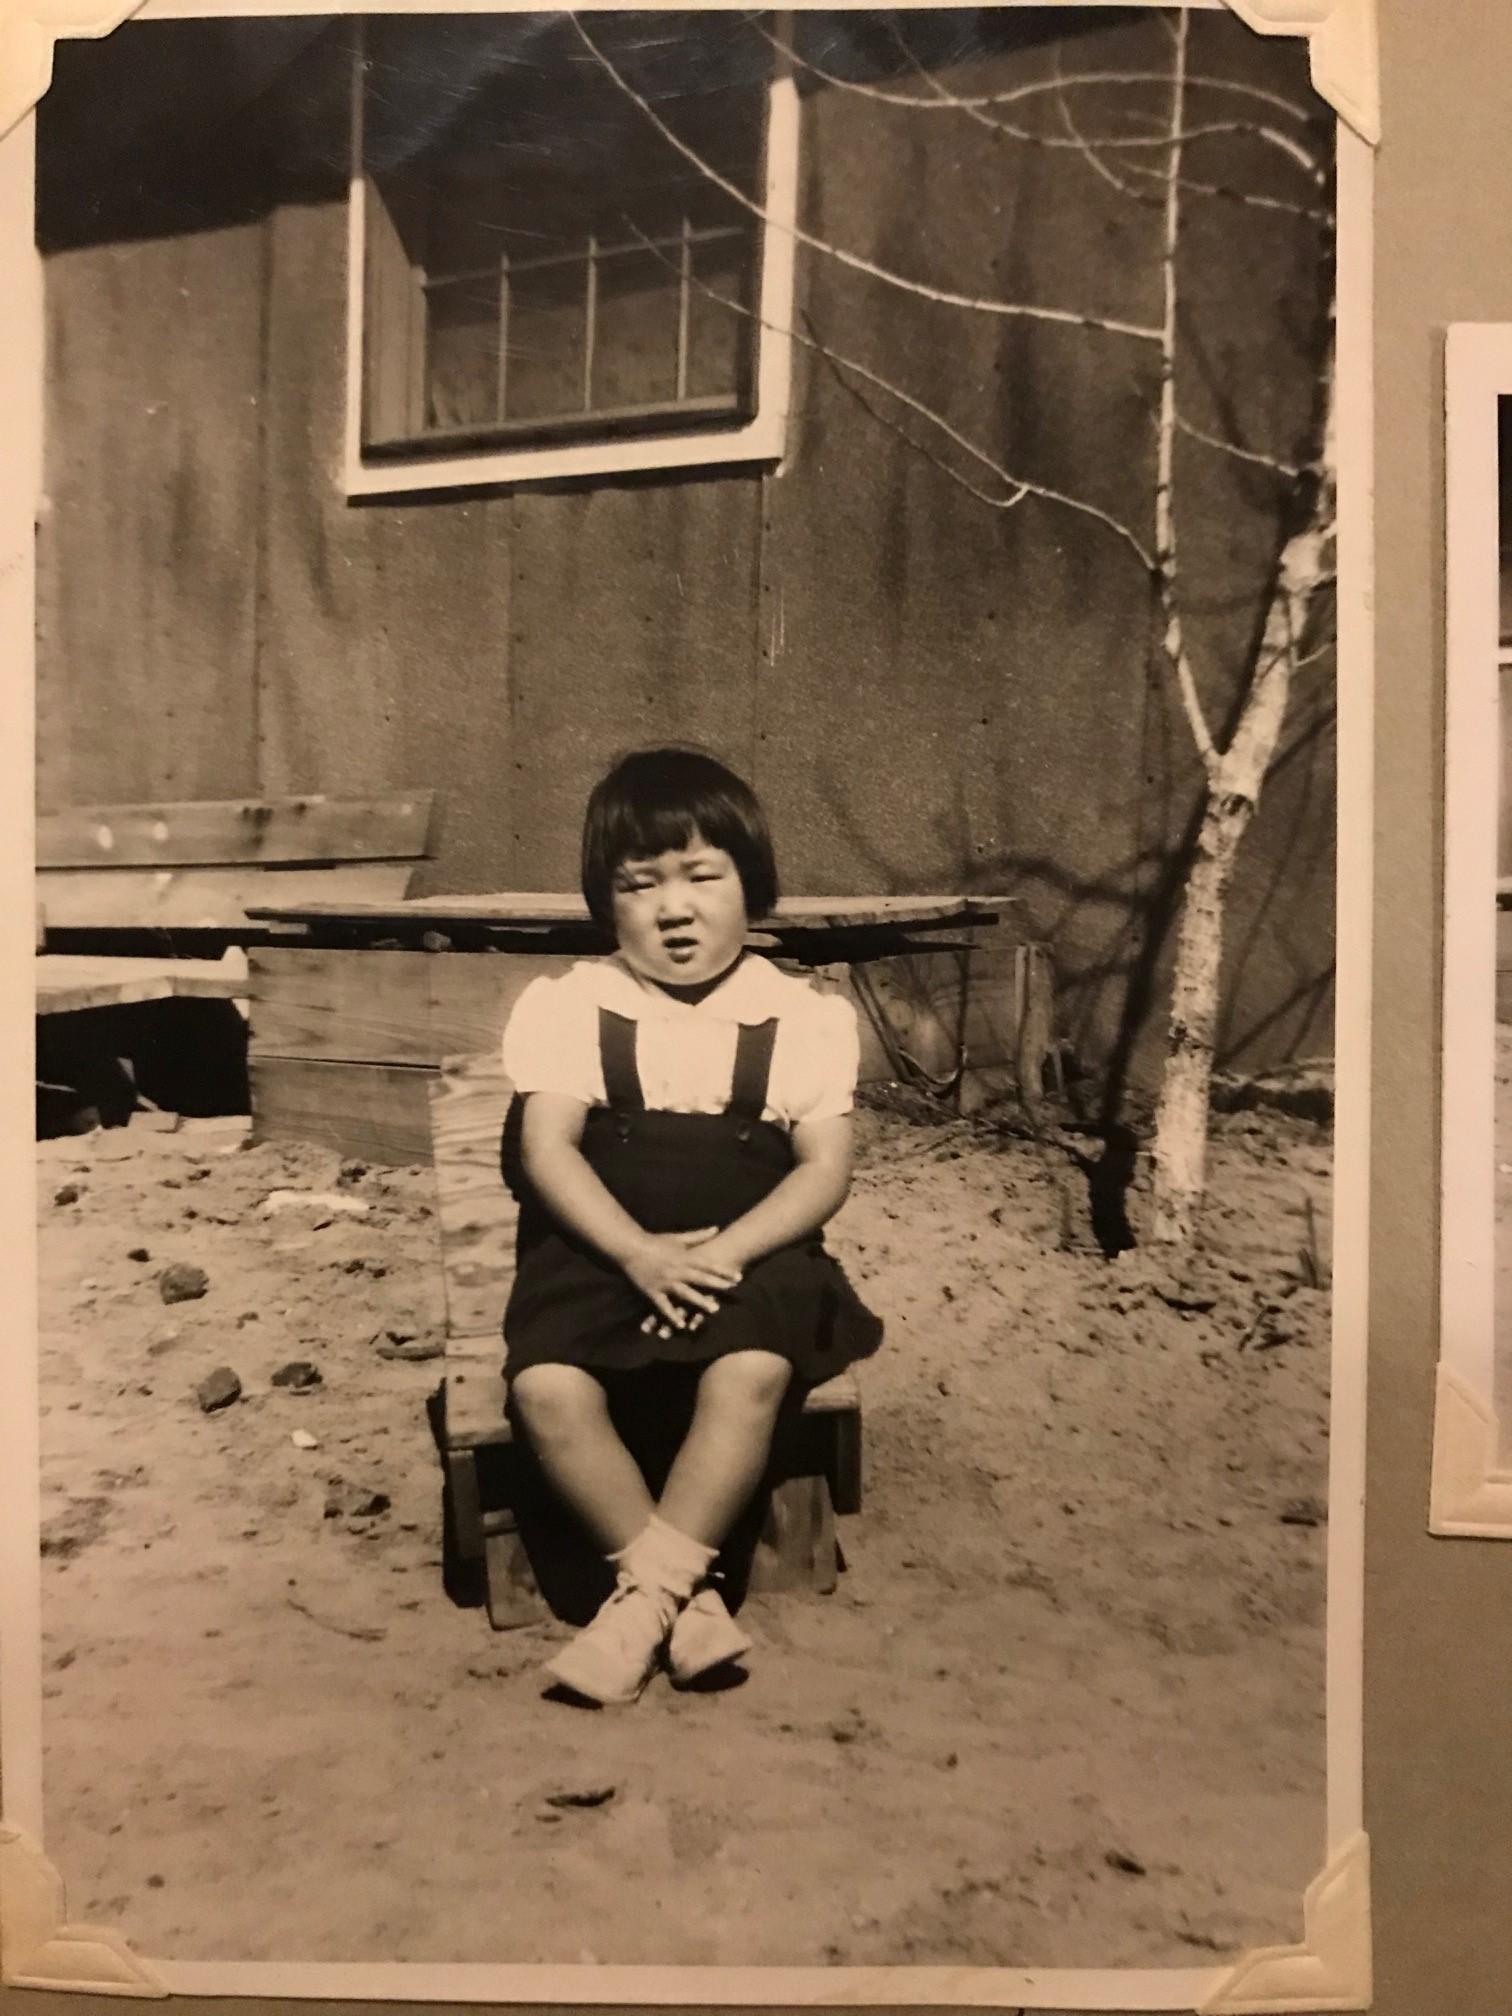 (My mother, Susan Yahiro Asklipiadis, outside of her family's barrack.Photos Courtesy of Yahiro Family)